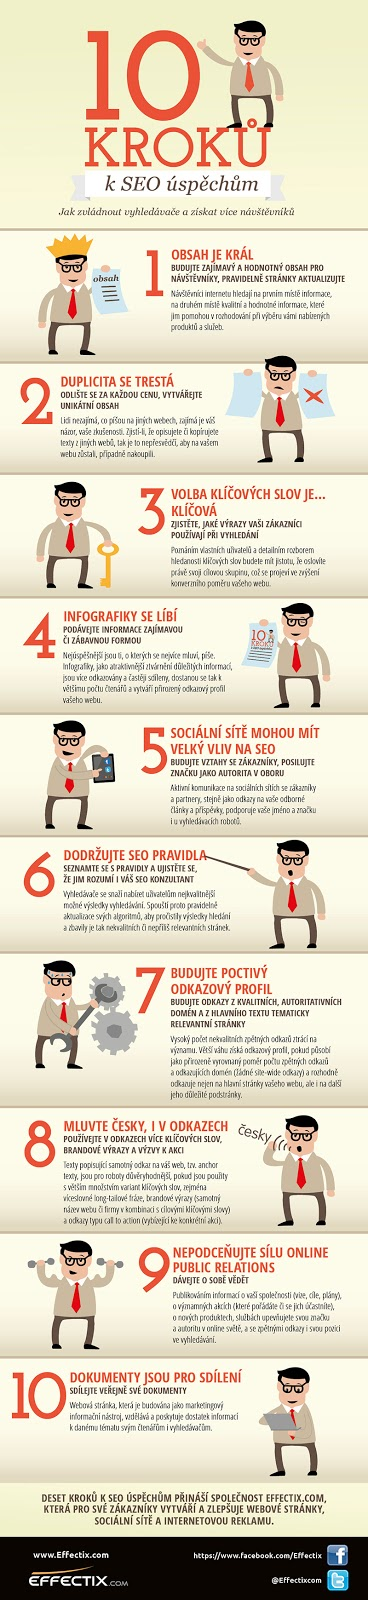 Infografika Effectix - 10 kroků k SEO úspěchům